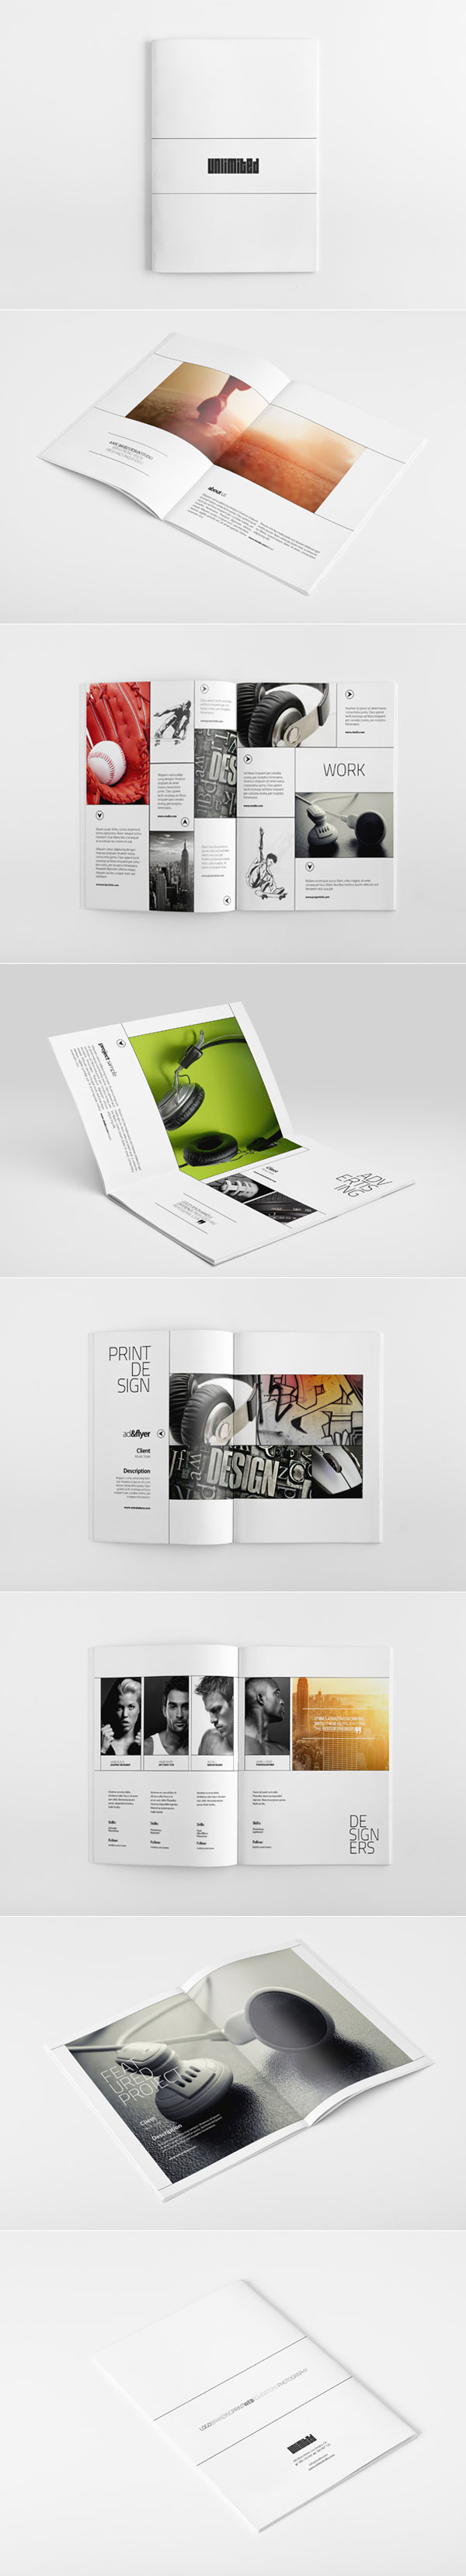 Portfolio-brochure-design-ideas